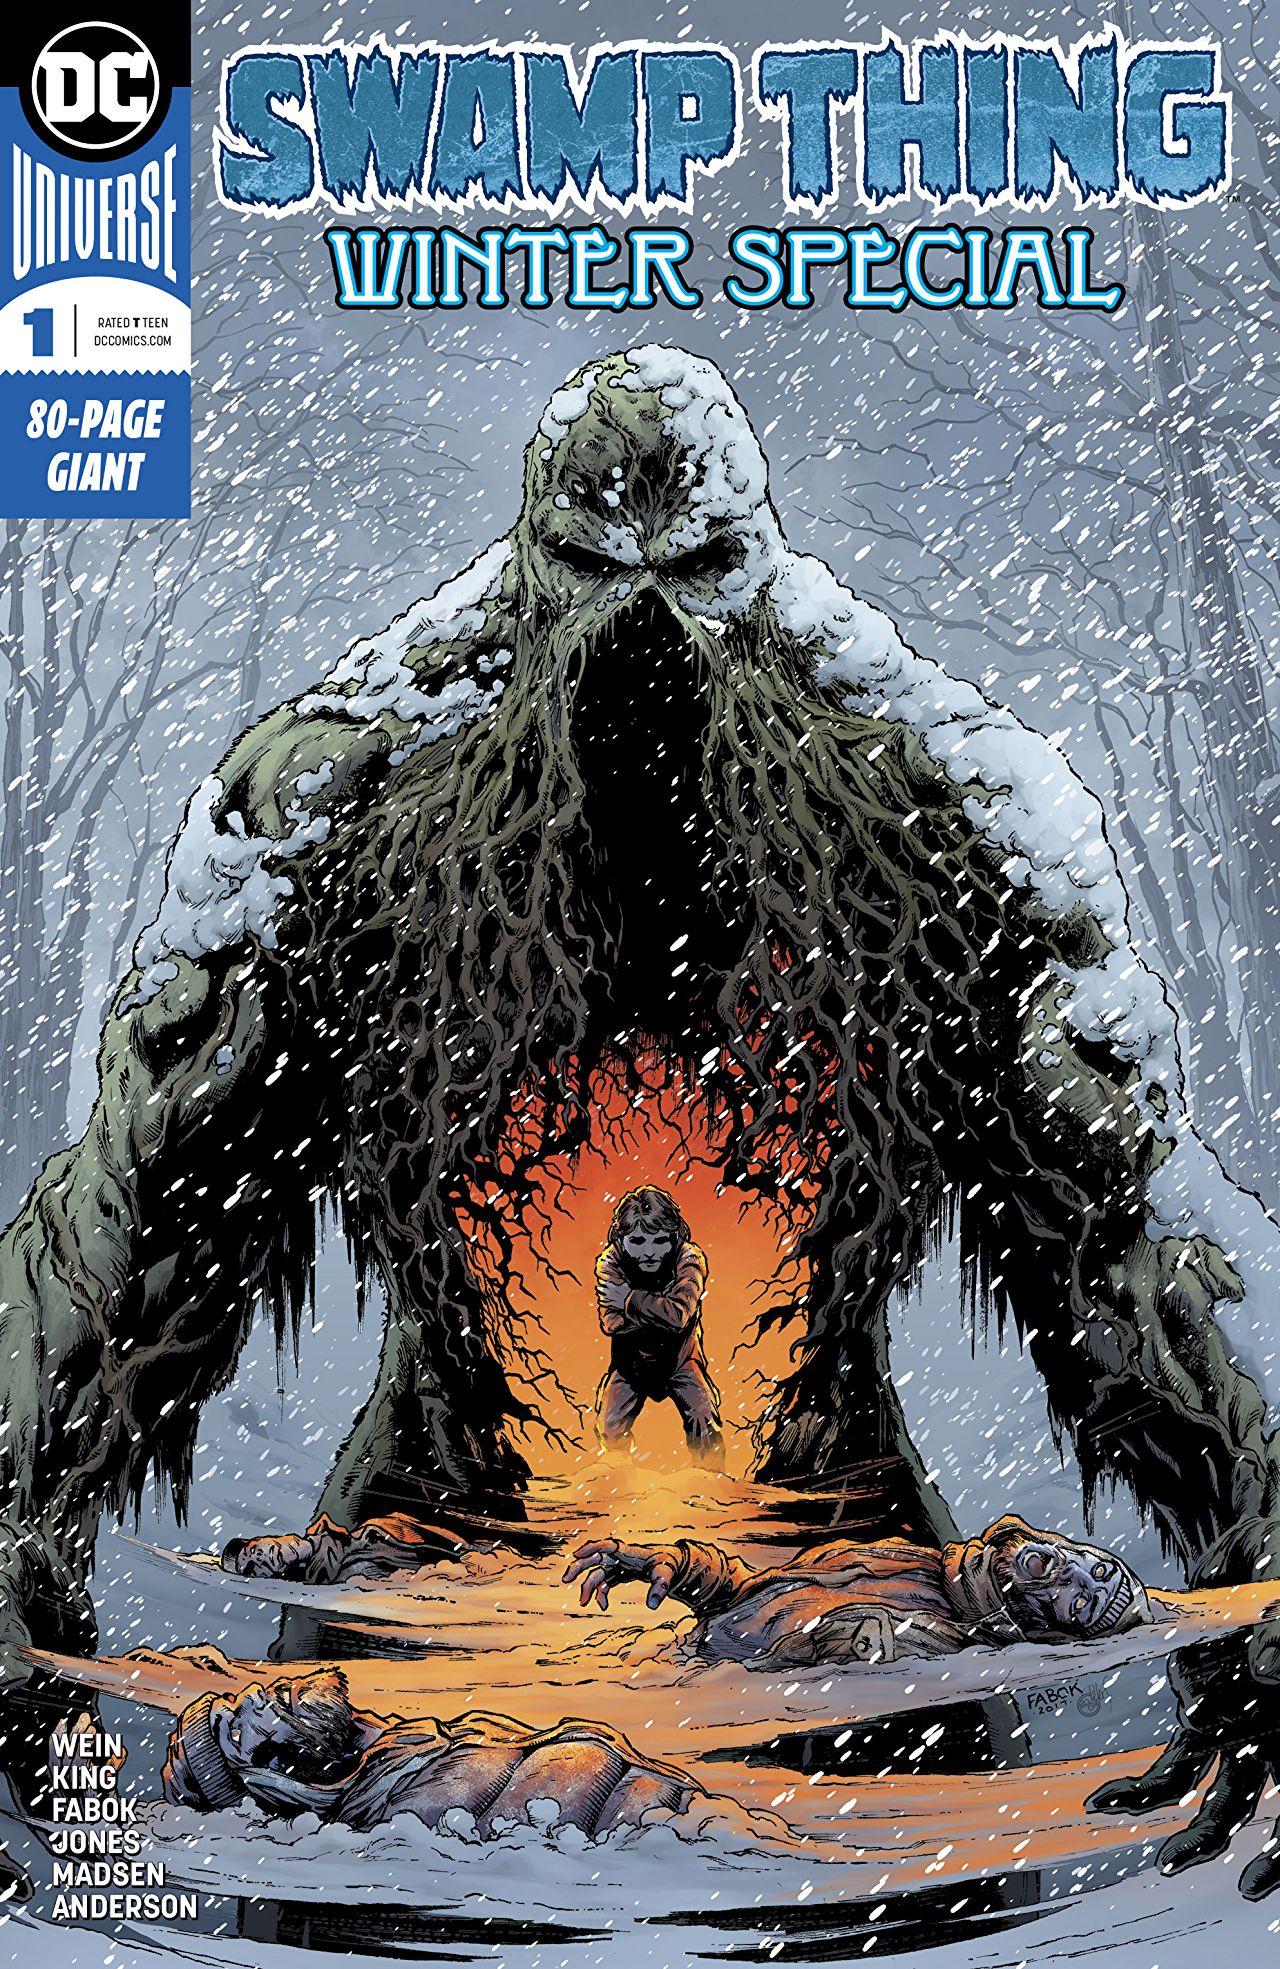 Swamp Thing Winter Special.jpg